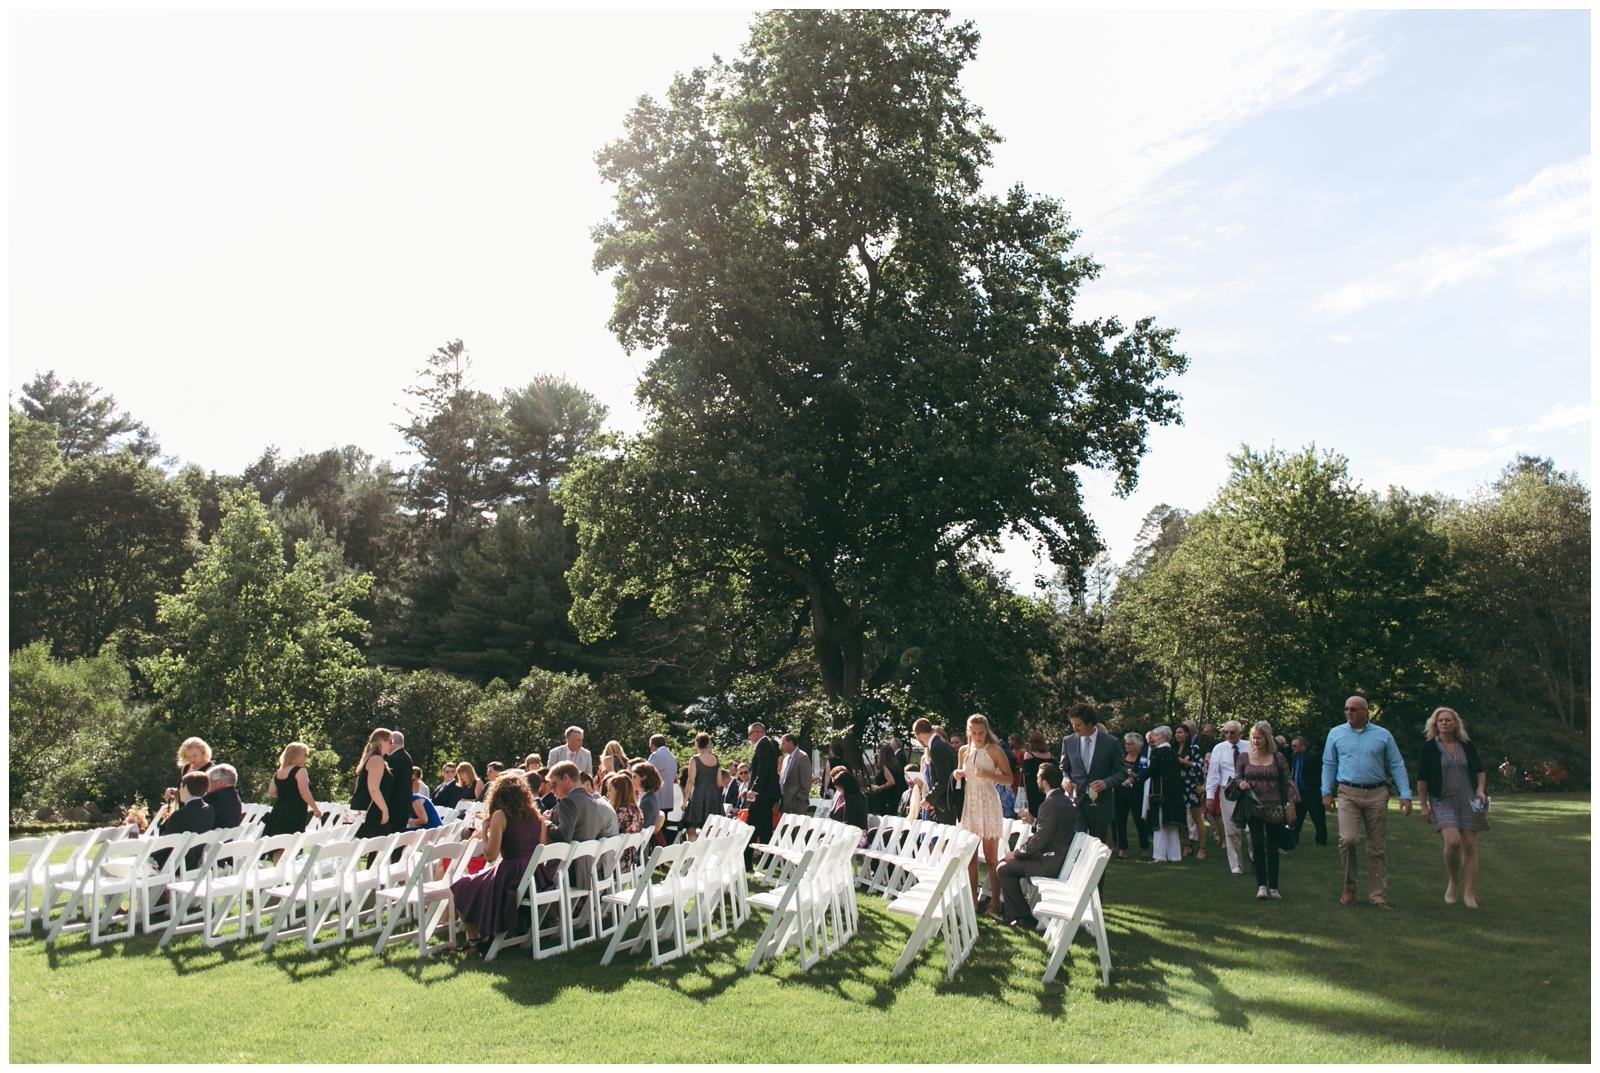 Moraine-Farm-wedding-Bailey-Q-Photo-Massachusetts-wedding-photpgrapher-052.jpg